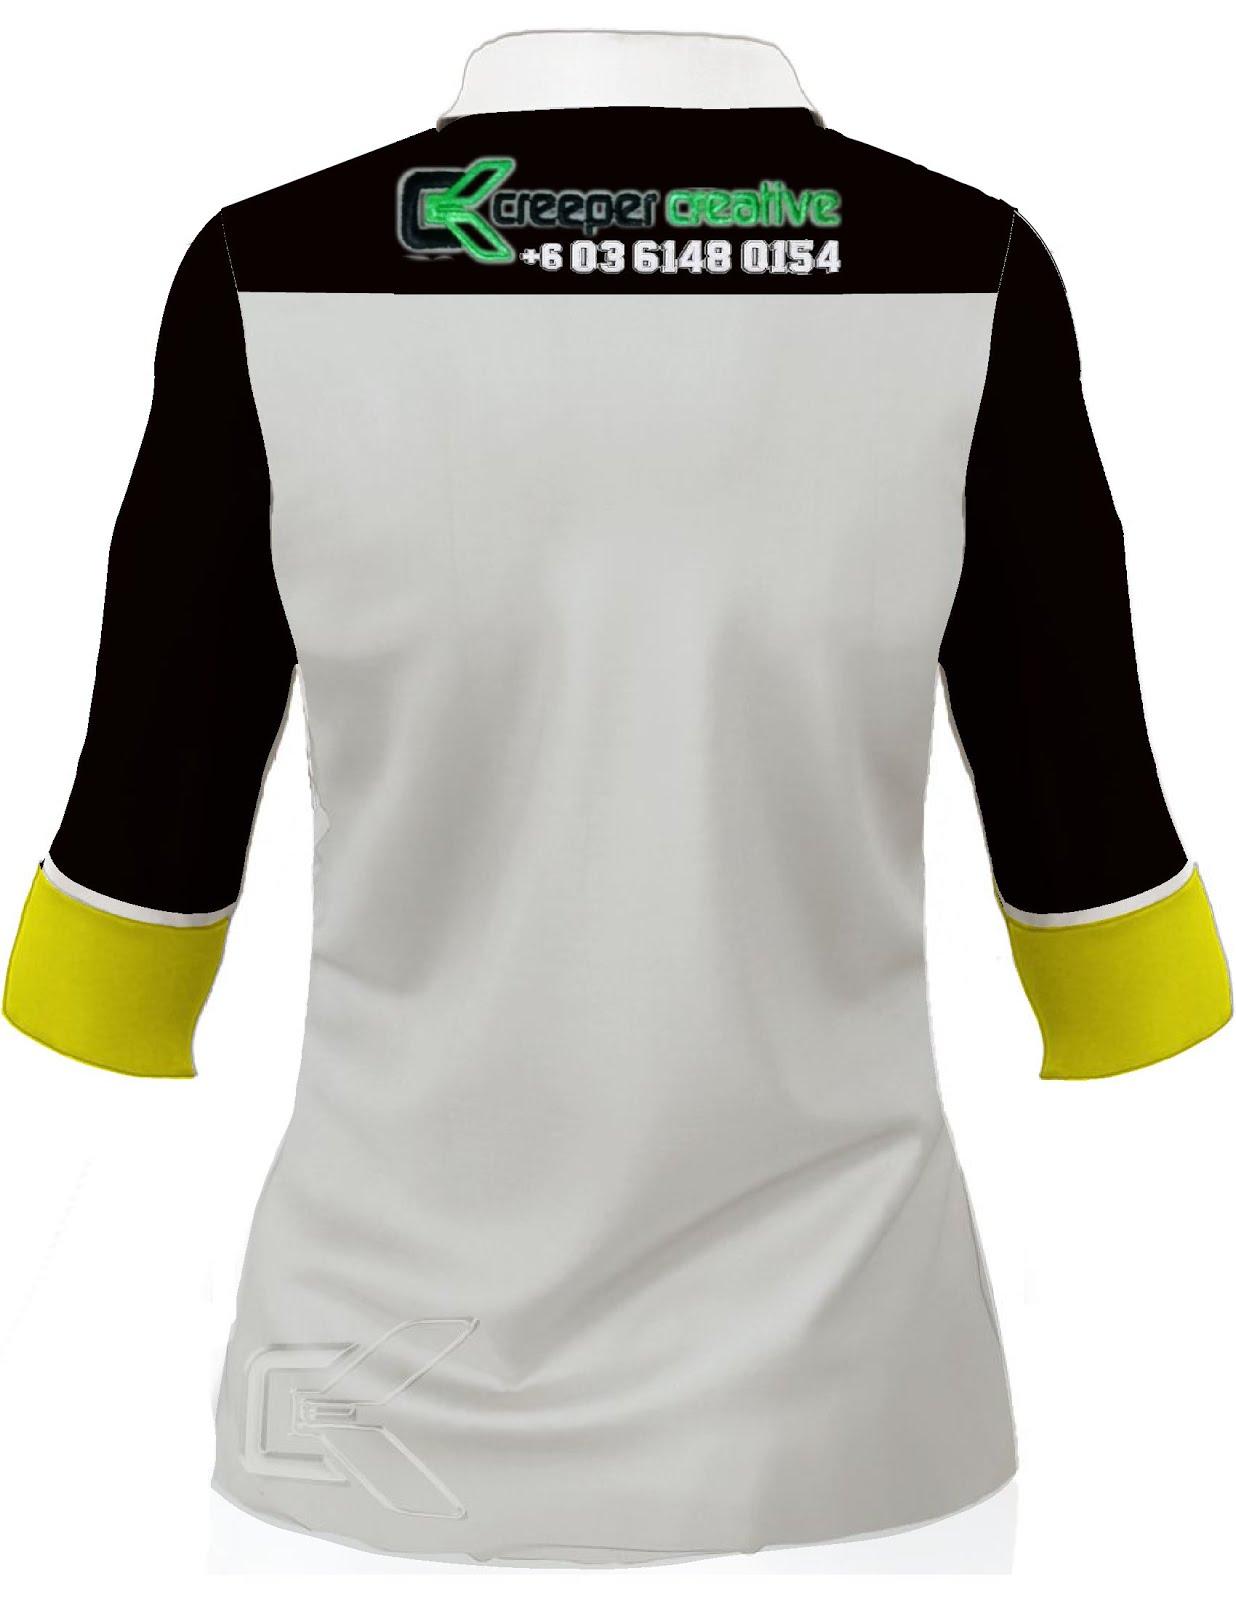 Custom Made MALE SHIRT FEMALE SHIRT MUSLIMAH LABUH Shirt Type SHORT SLEEVE QUARTER SLEEVE LONG SLEEVE Material Fabric VISCOSE DOUBLE YARN